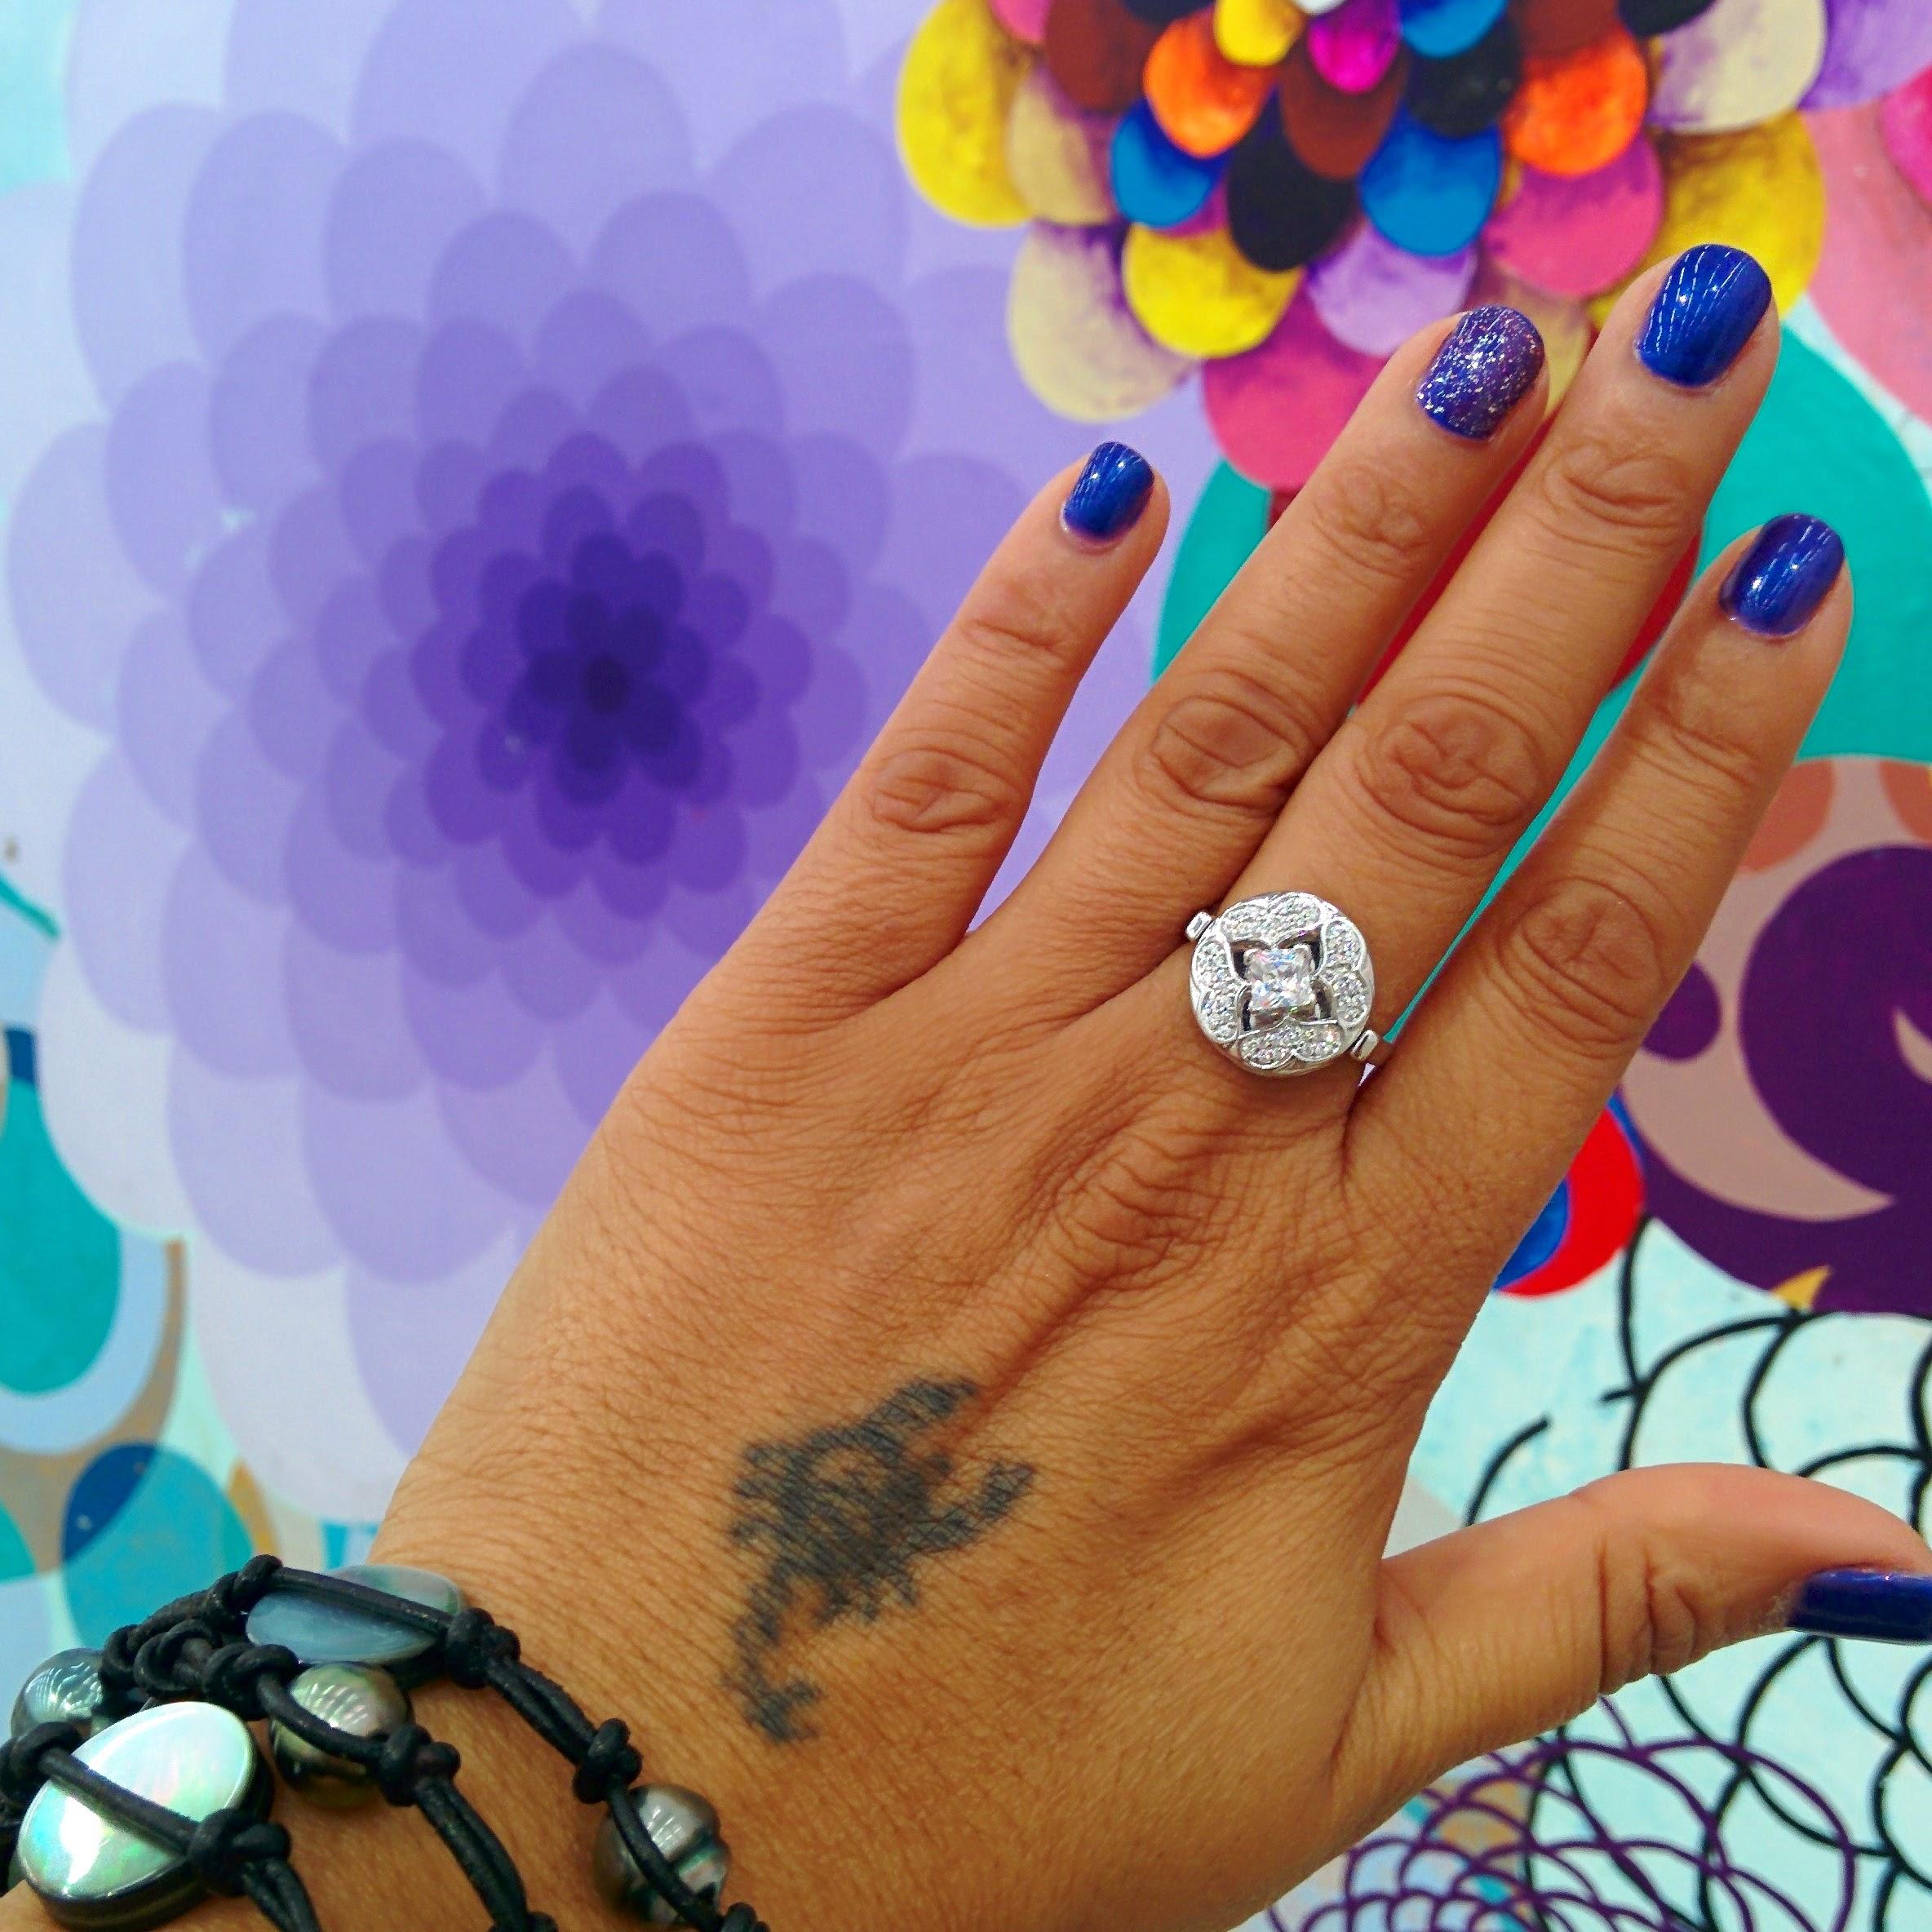 Galium ring_NurtureByReena_Reena Ahluwalia_Lab-Grown Diamonds.jpg